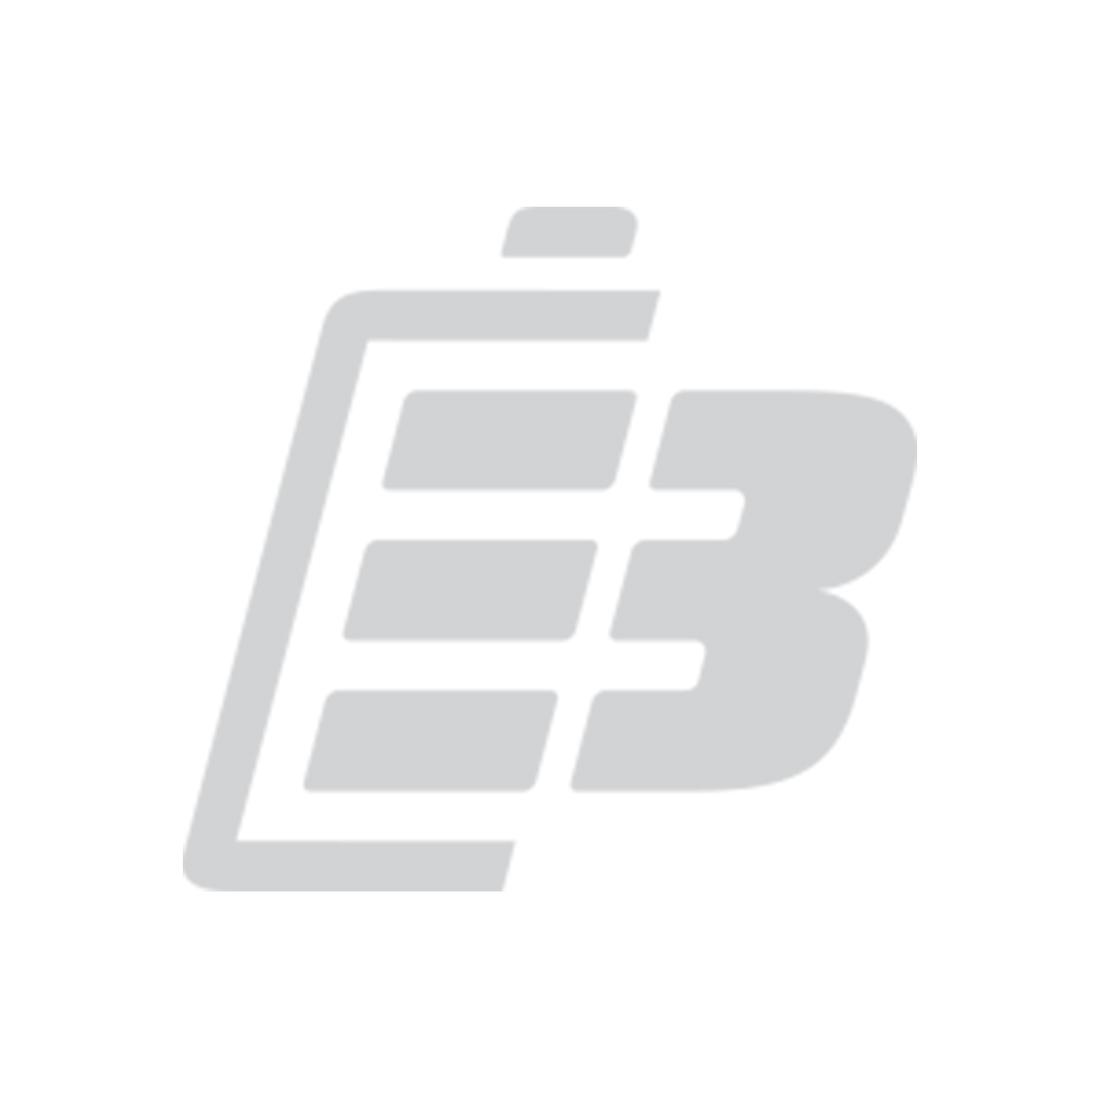 Cordless phone battery Samsung SPR-5050_1